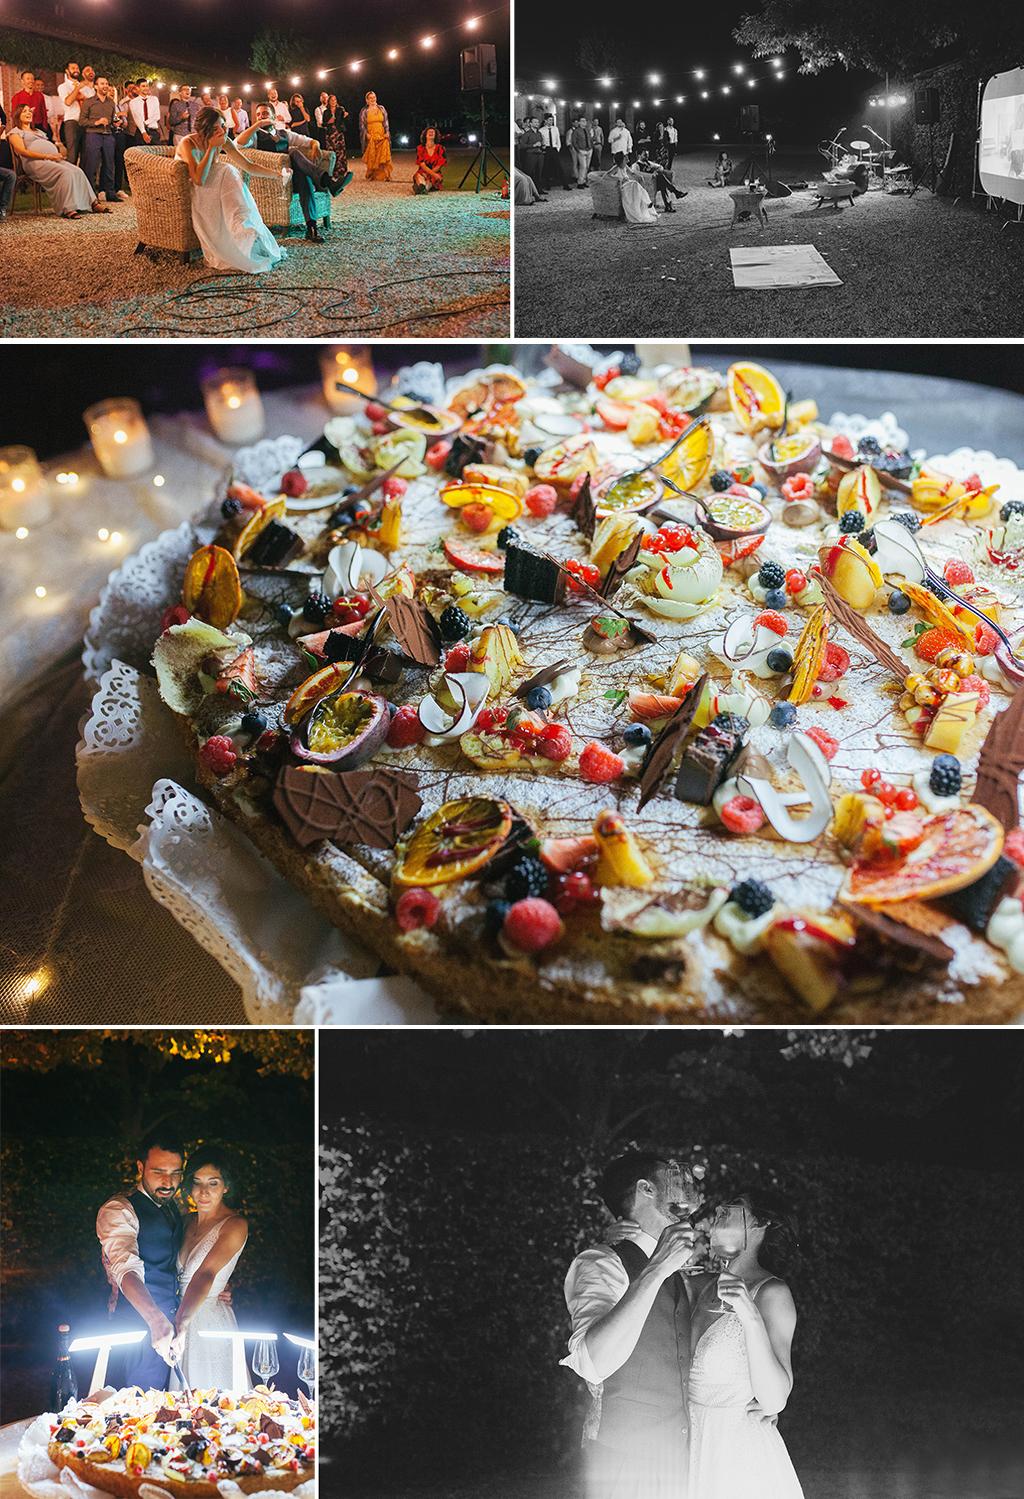 matrimonio le risare padova conegliano treviso veneto Deborah Brugnera ricevimento matrimonio torta